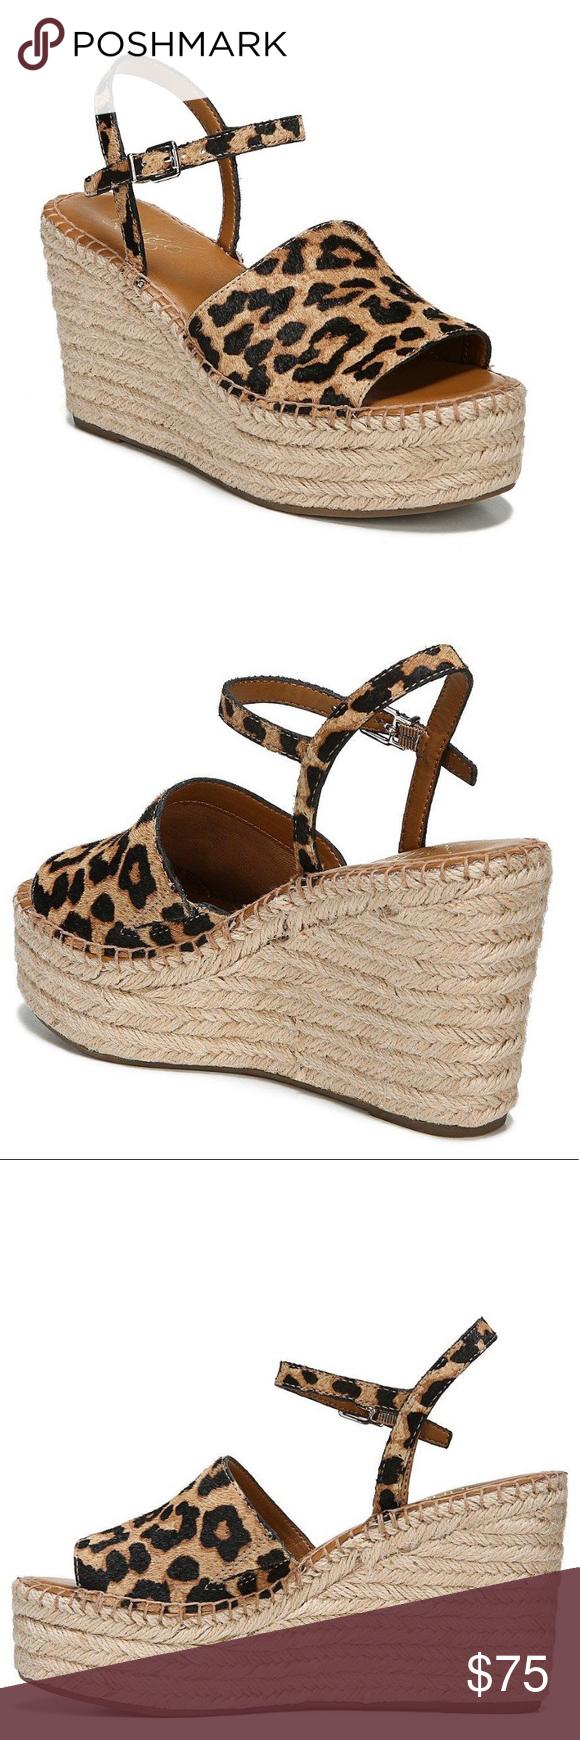 4c7f03b33162 Franco Sarto Tula Platform Espadrille Wedge Sandal New without box Leopard  print 3 3 4